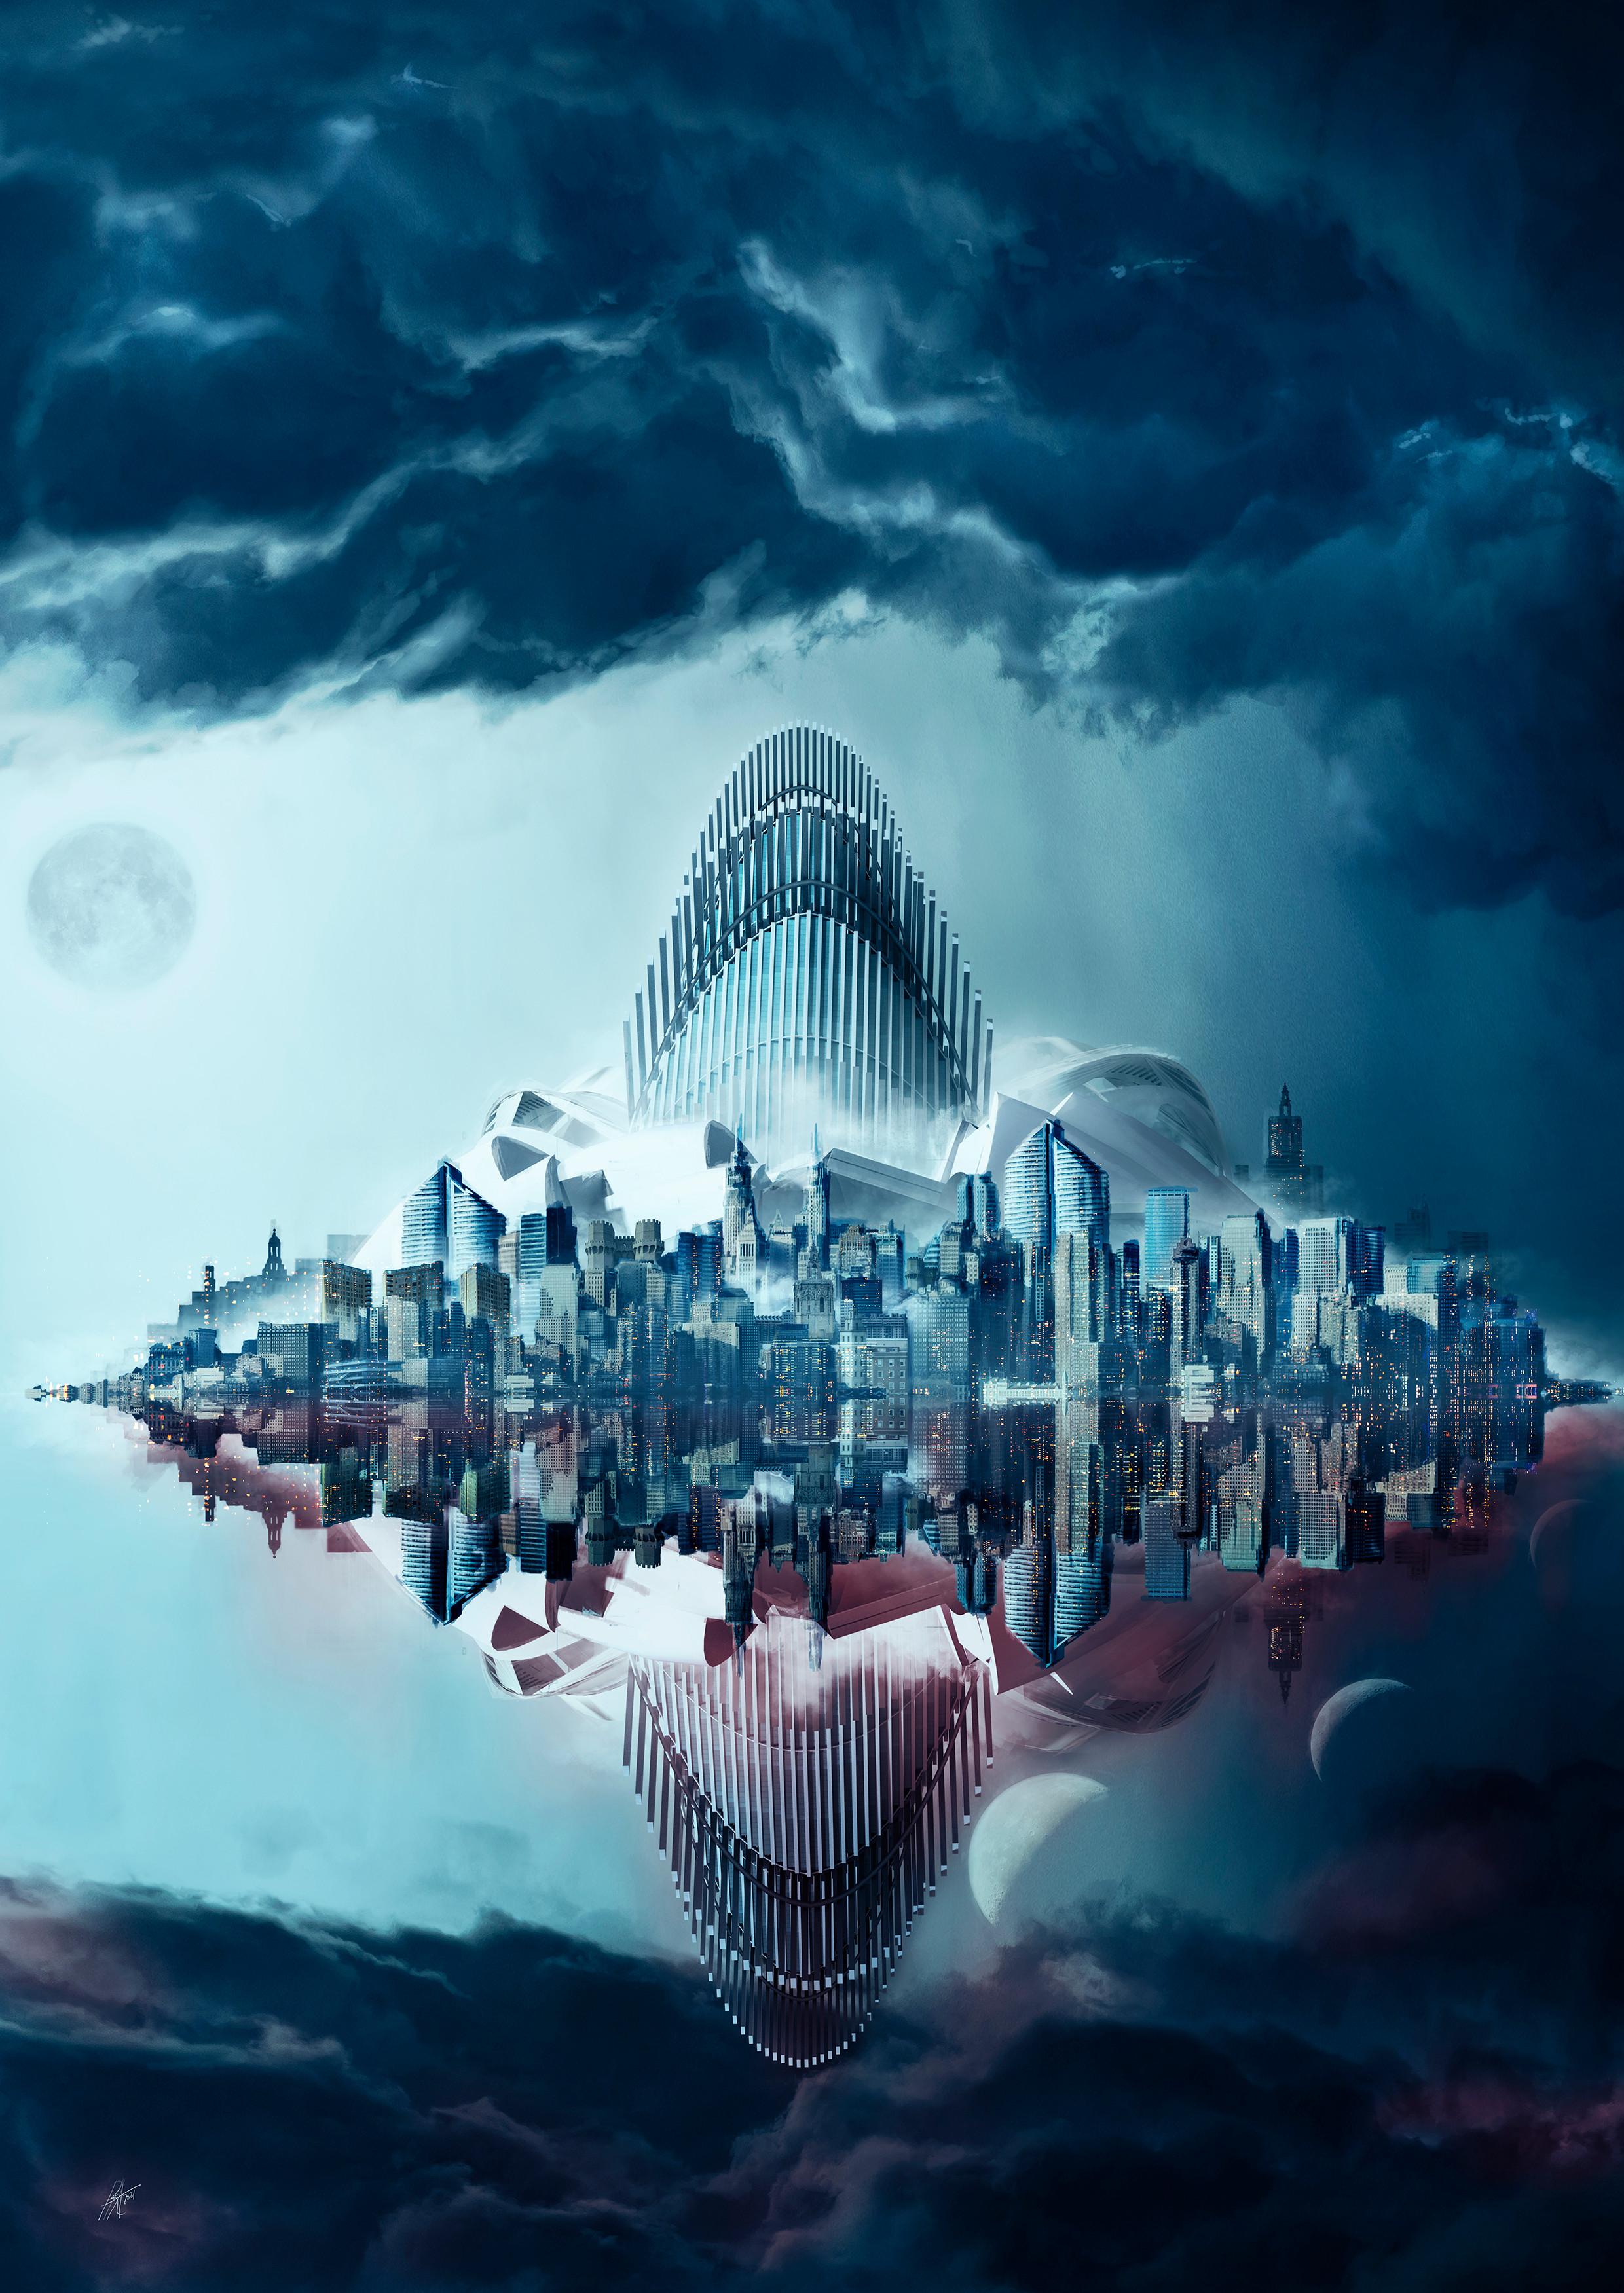 Khidsra Oculto, Final cover image